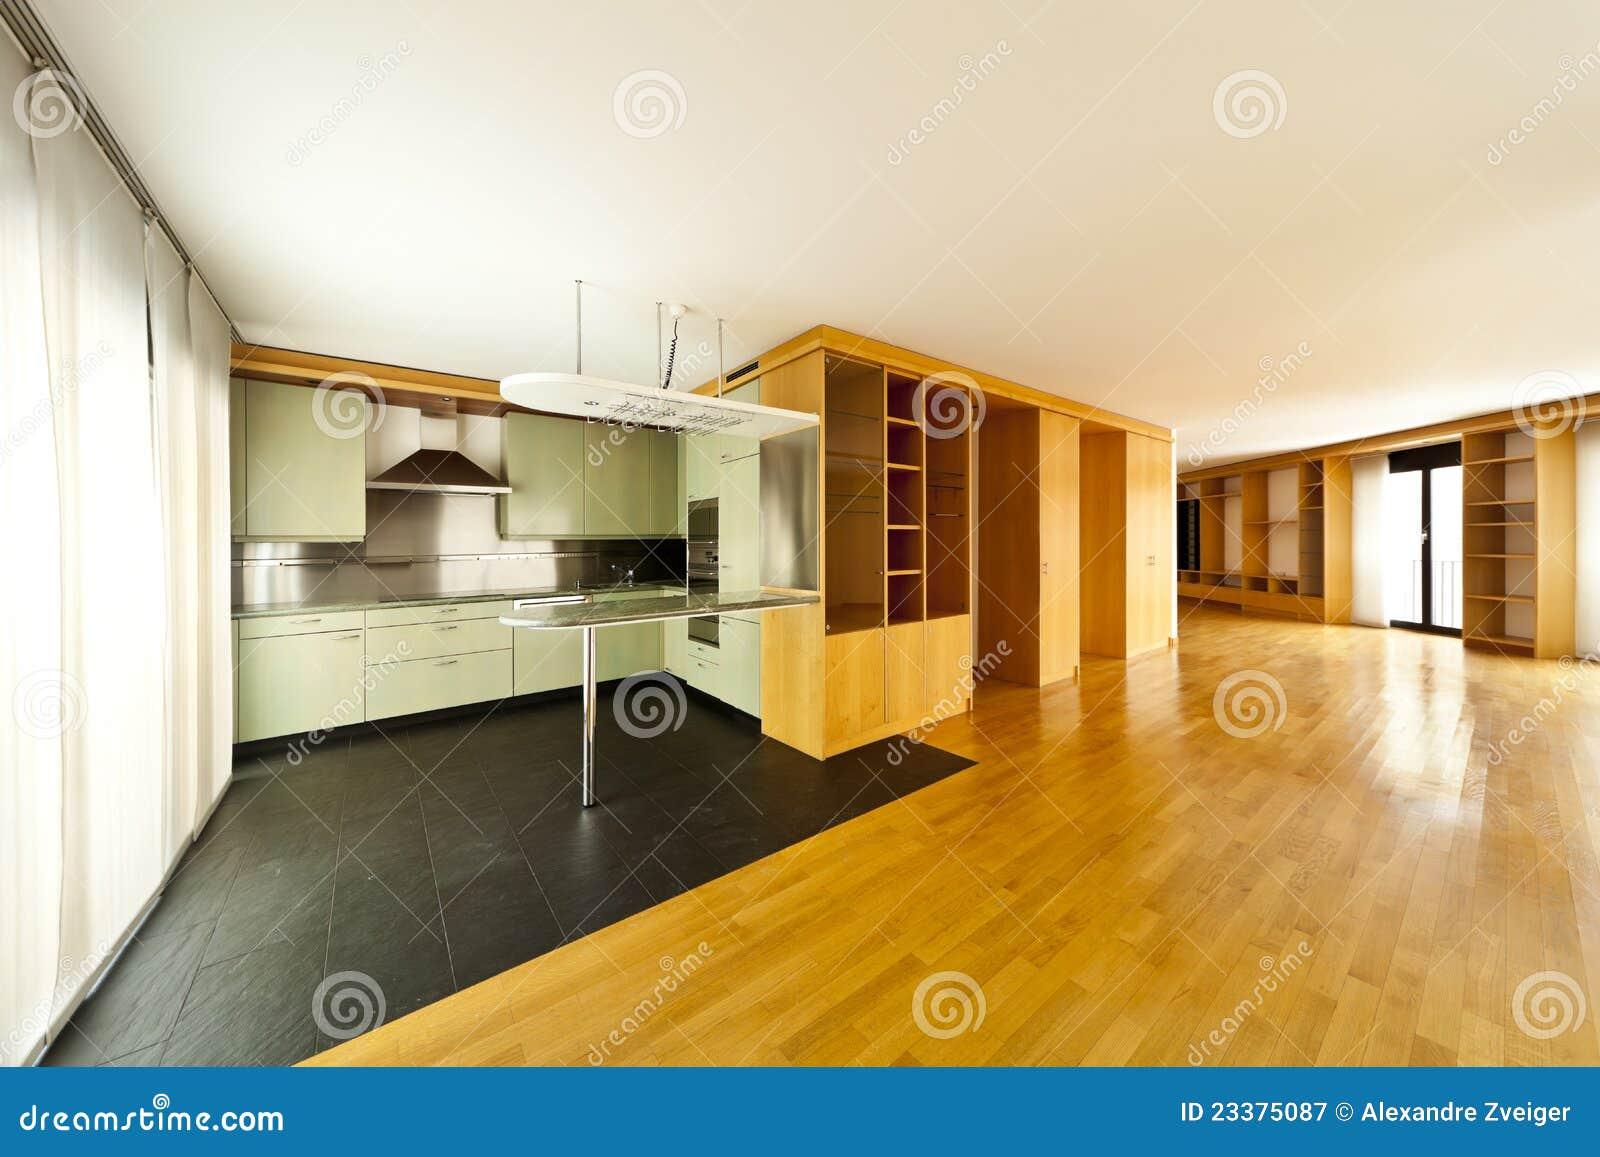 Beautiful apartment interior royalty free stock for Beautiful flats interior